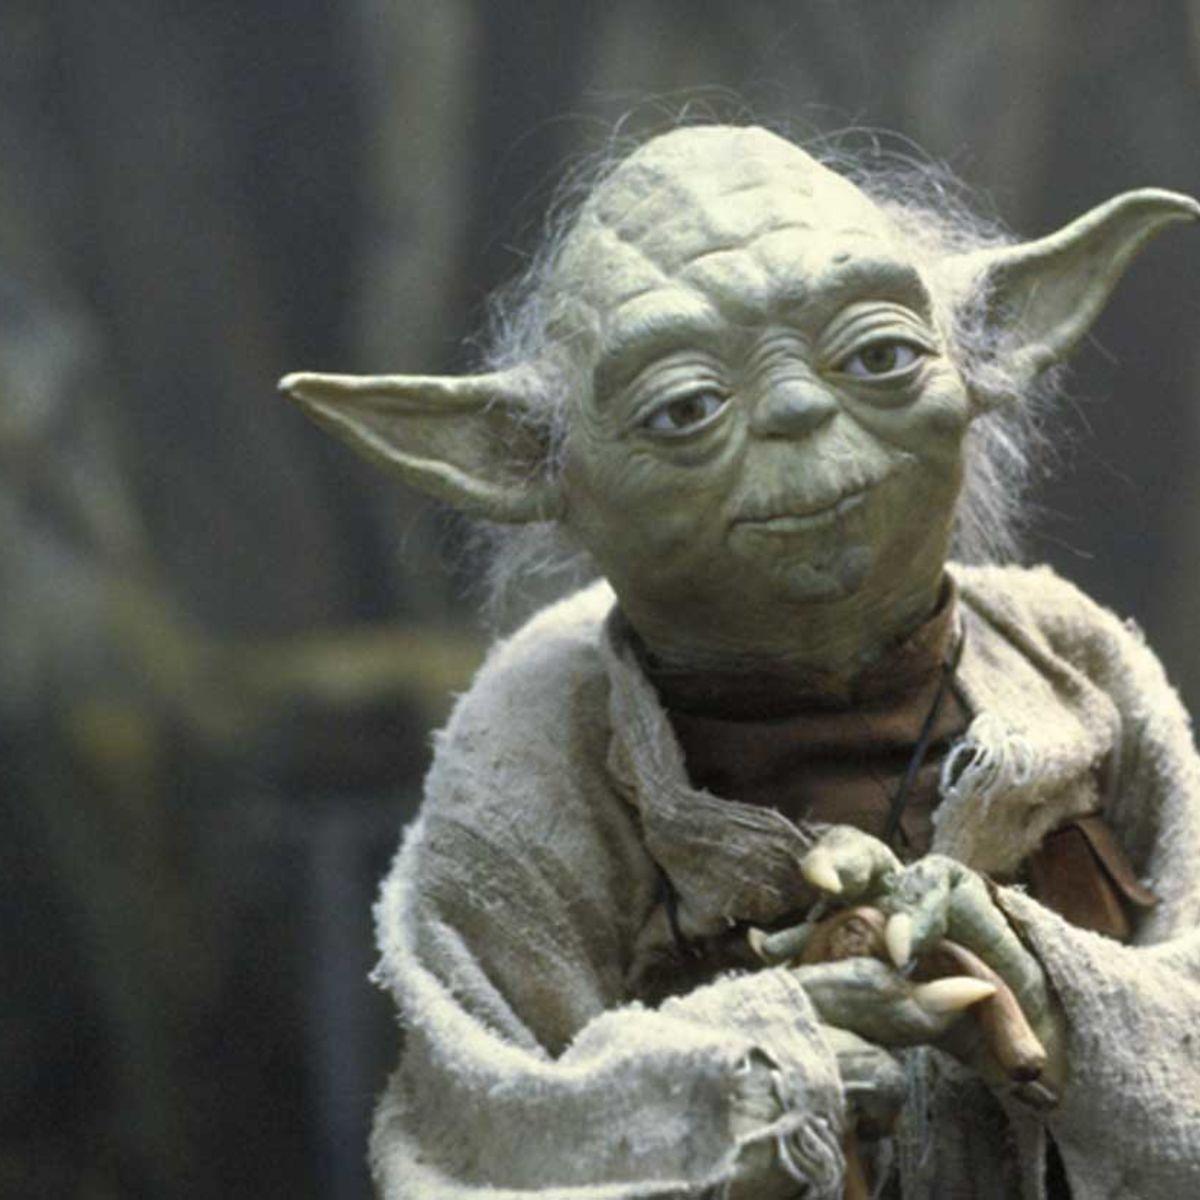 Yodapuppet.jpeg